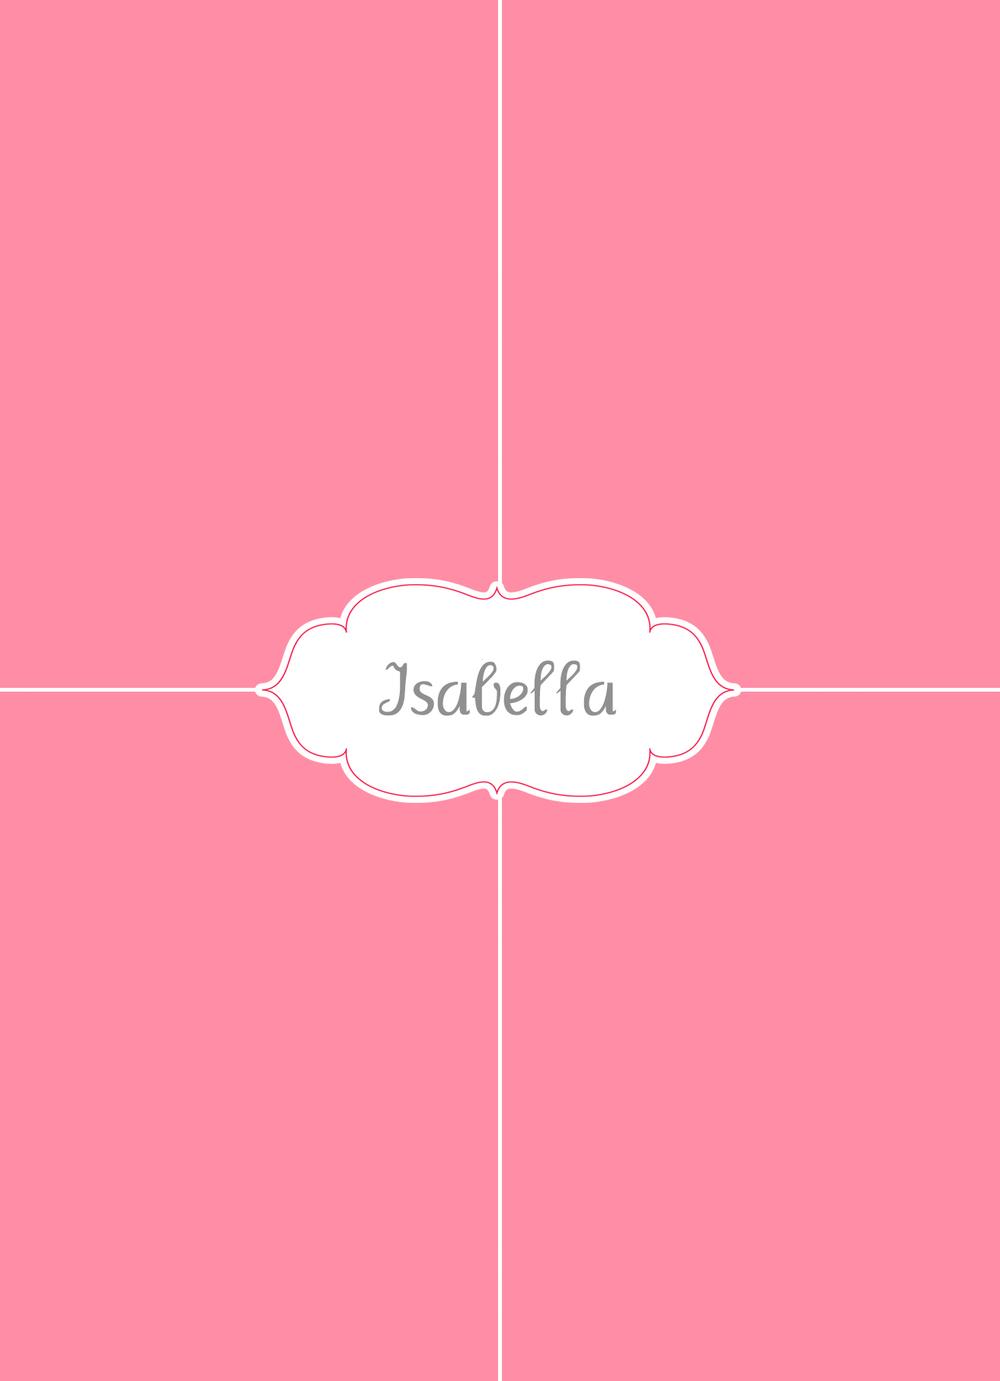 isabella_5x7OrnateMillersbackt_ohsnapboutque.jpg